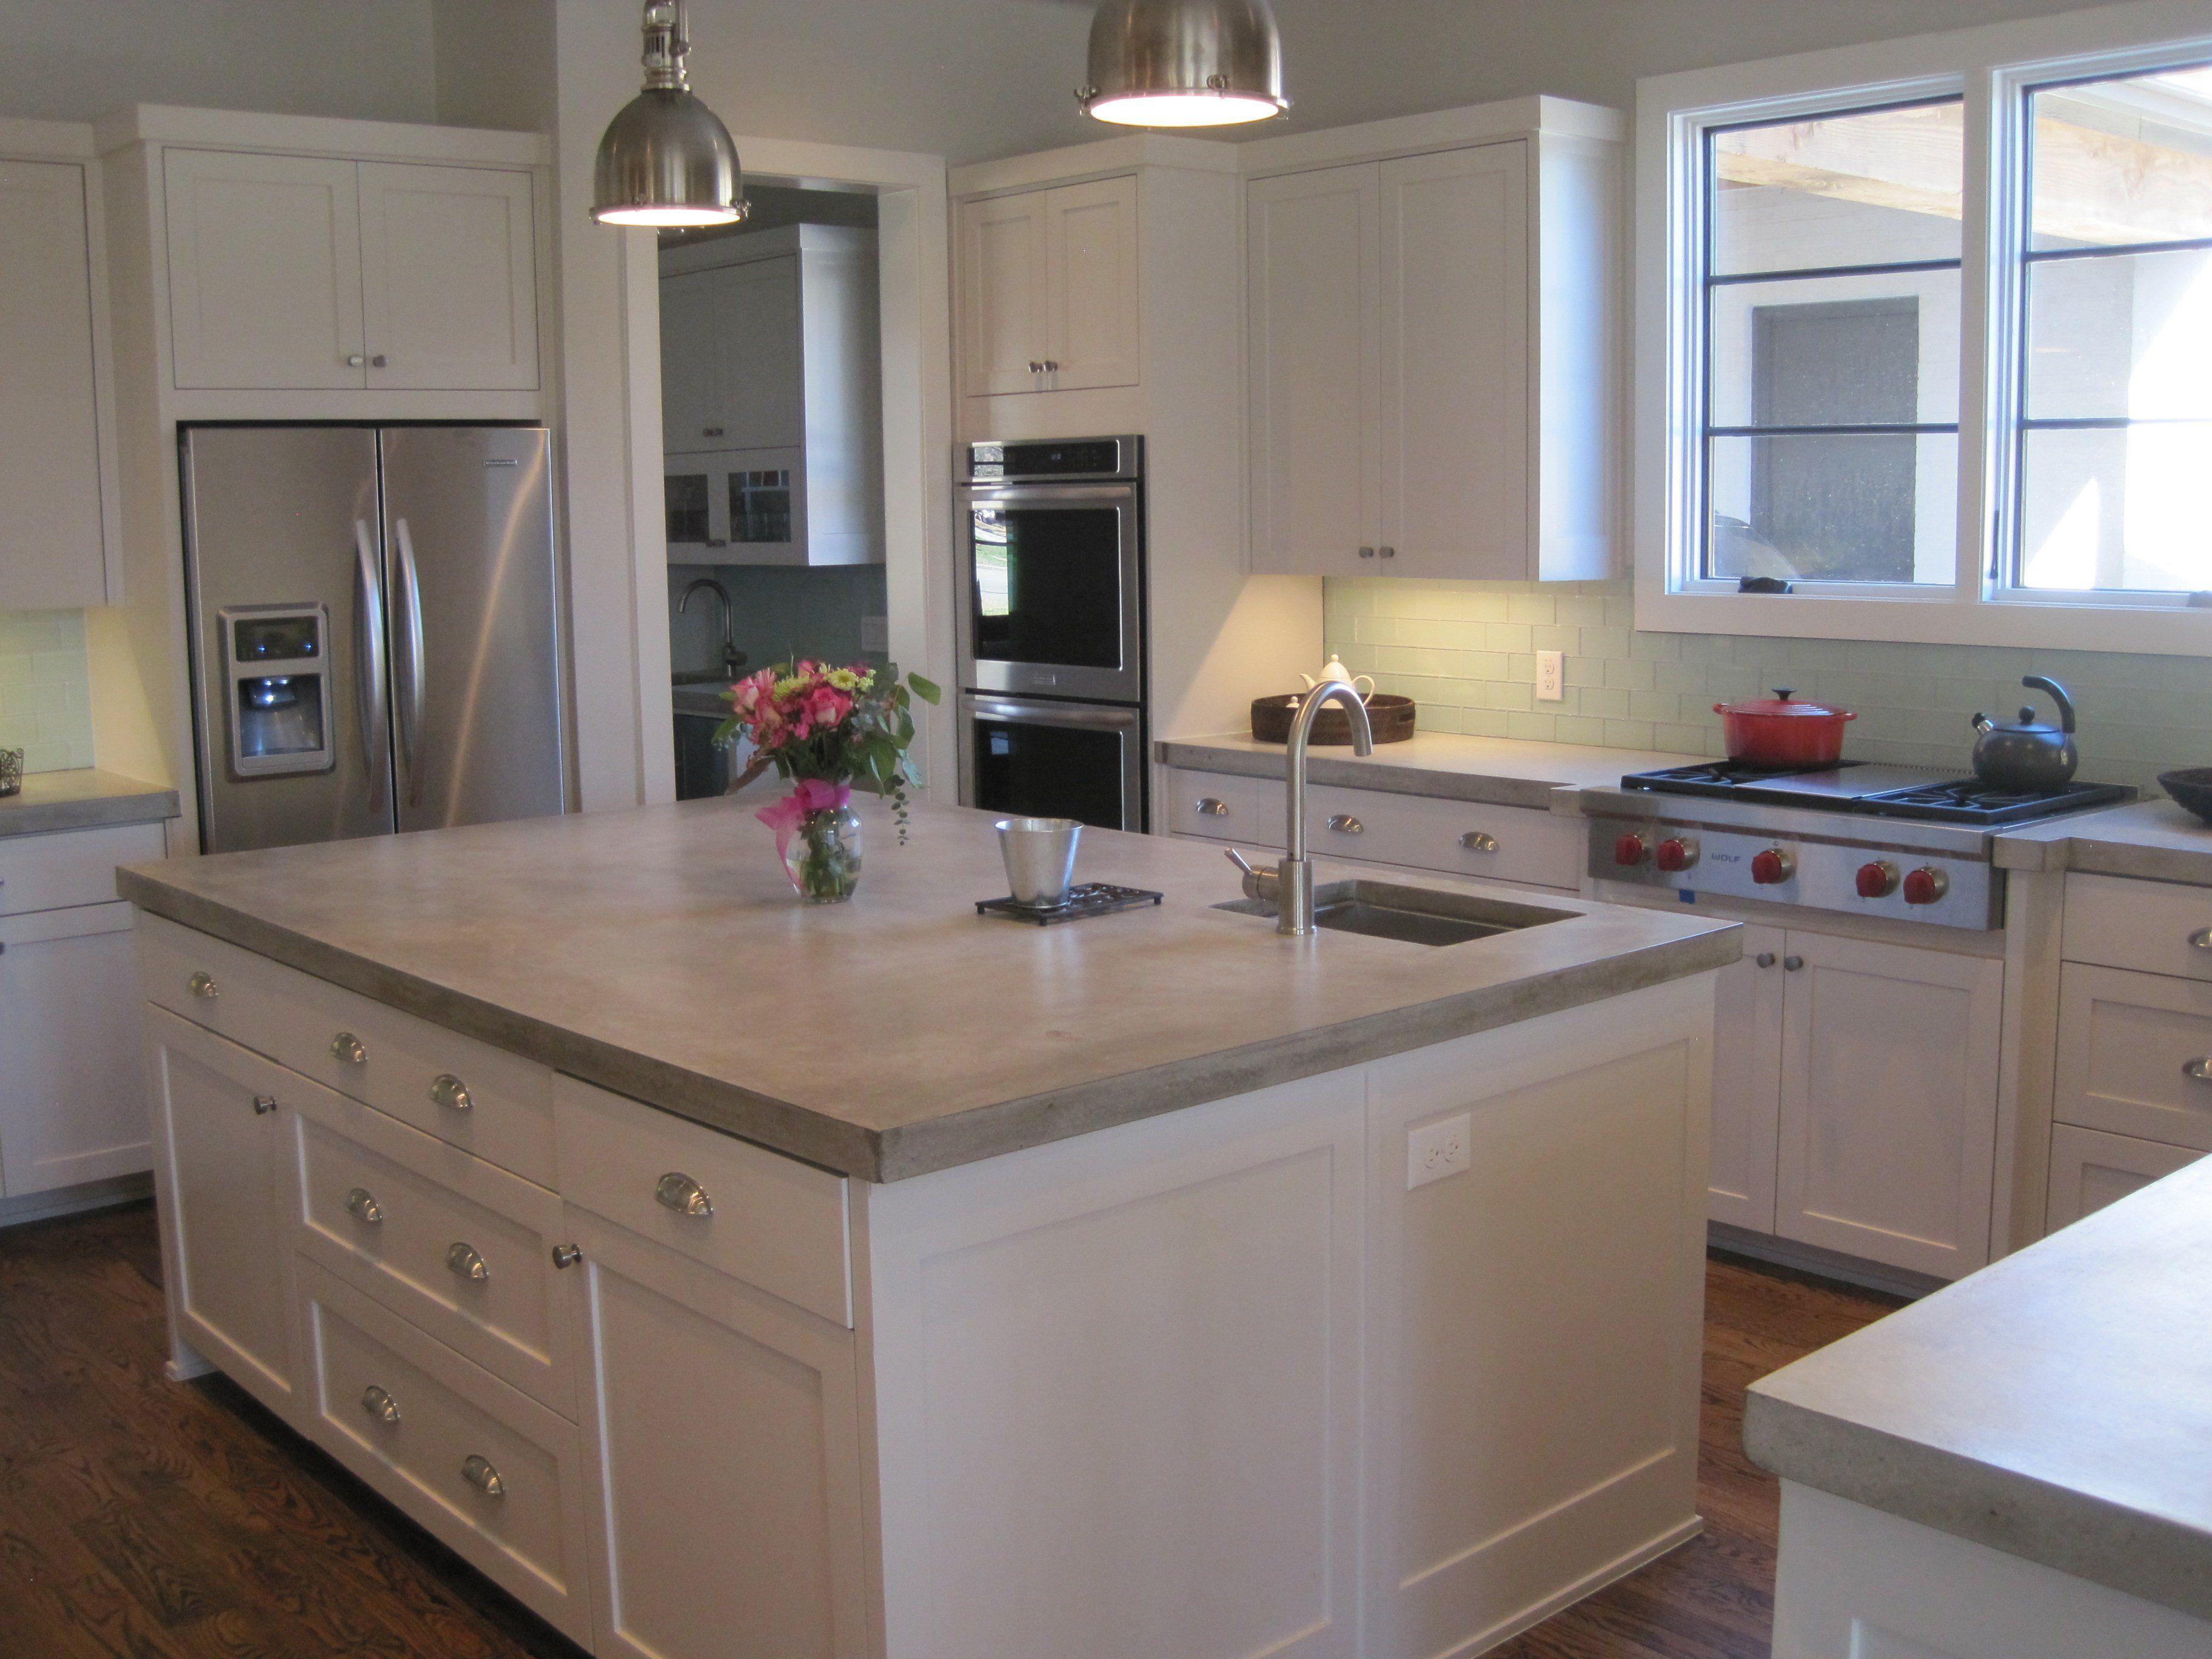 Countertops For Kitchen Cheap Utensils Concrete Our House Pinterest